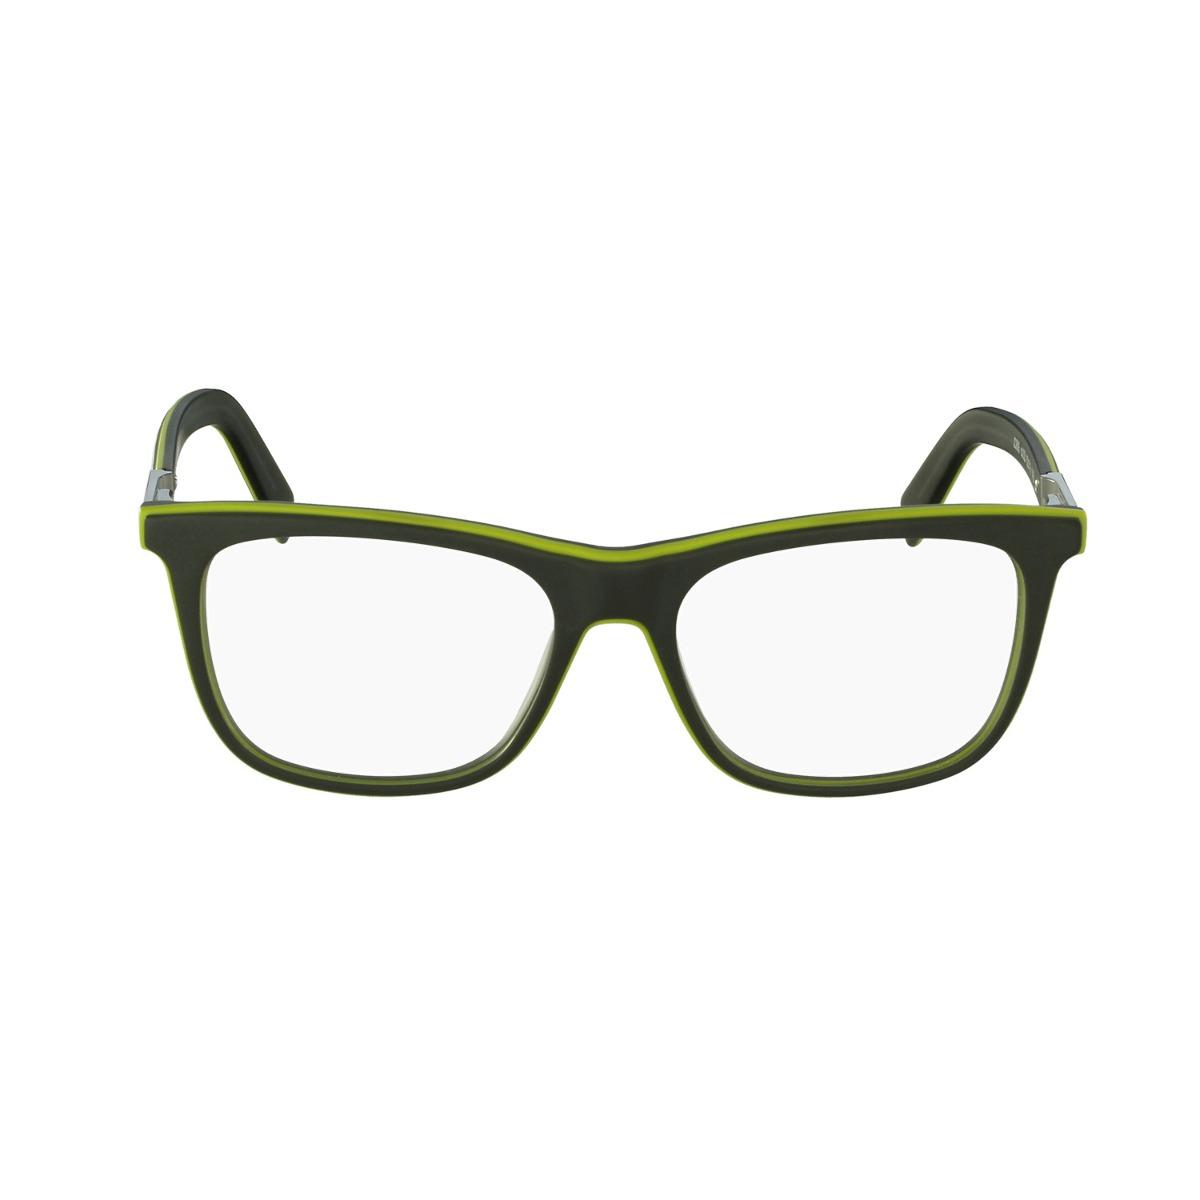 Óculos De Grau Just Cavalli Casual Verde - R  279,00 em Mercado Livre 576bc8dff3